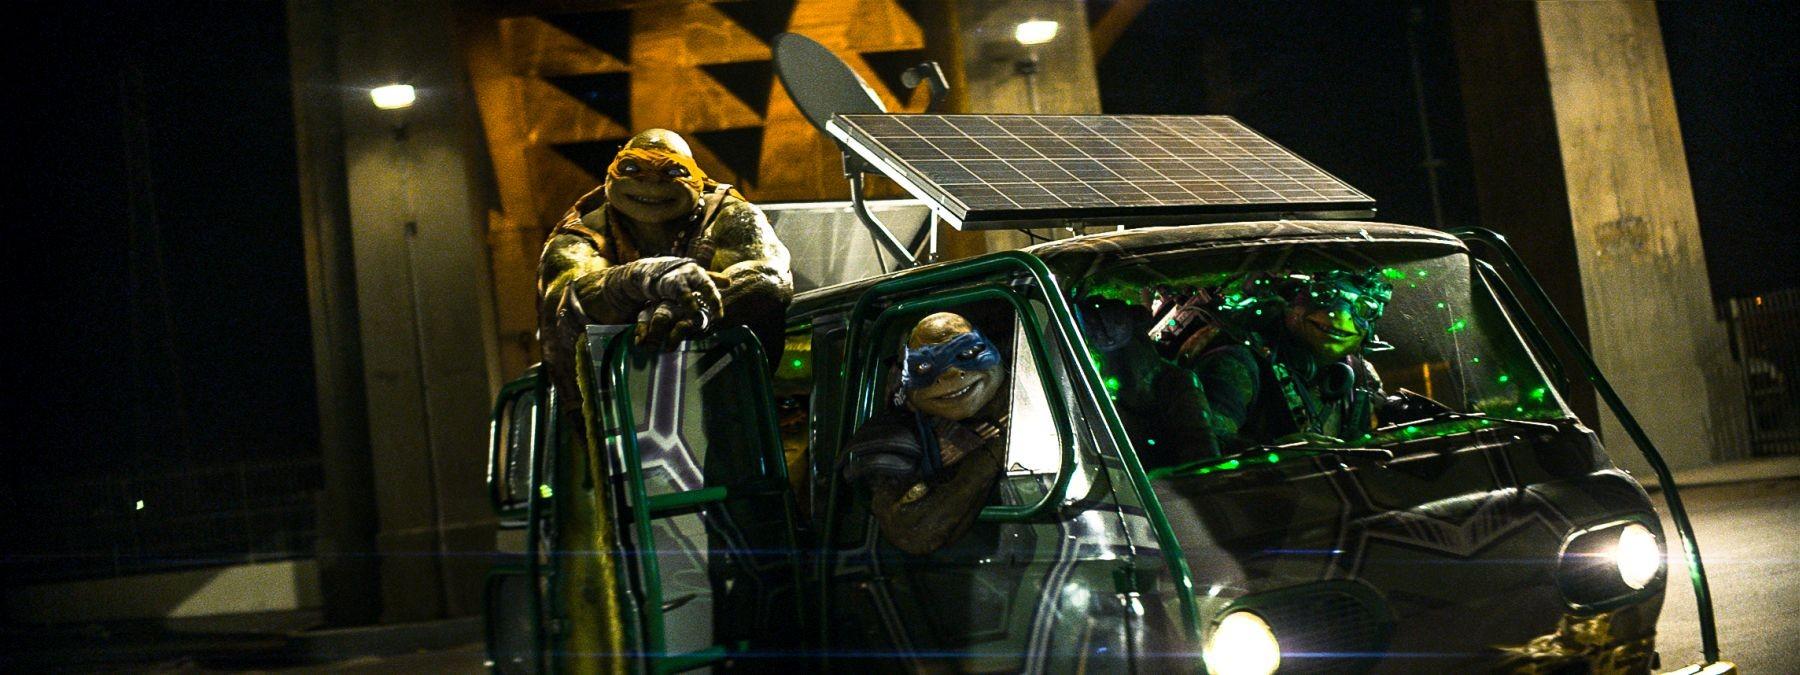 Tartarughe Ninja: i quattro mutanti tartaruga in una scena del film